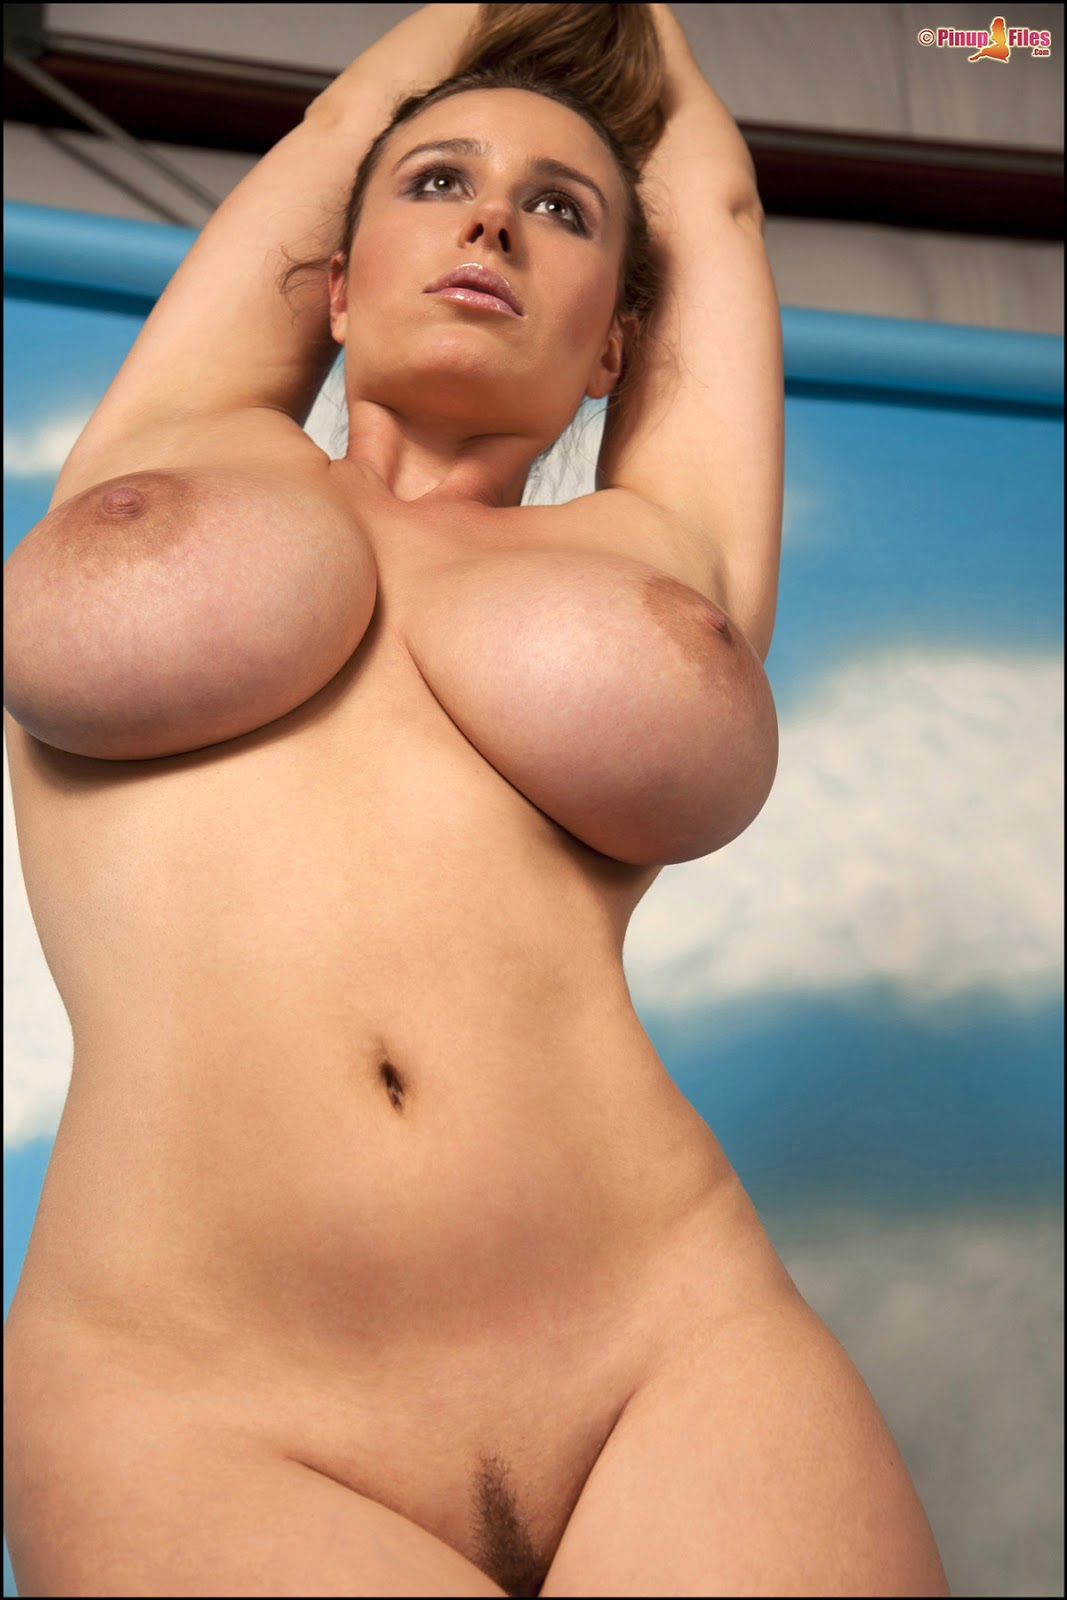 Vassanta Pinup Files Nudes